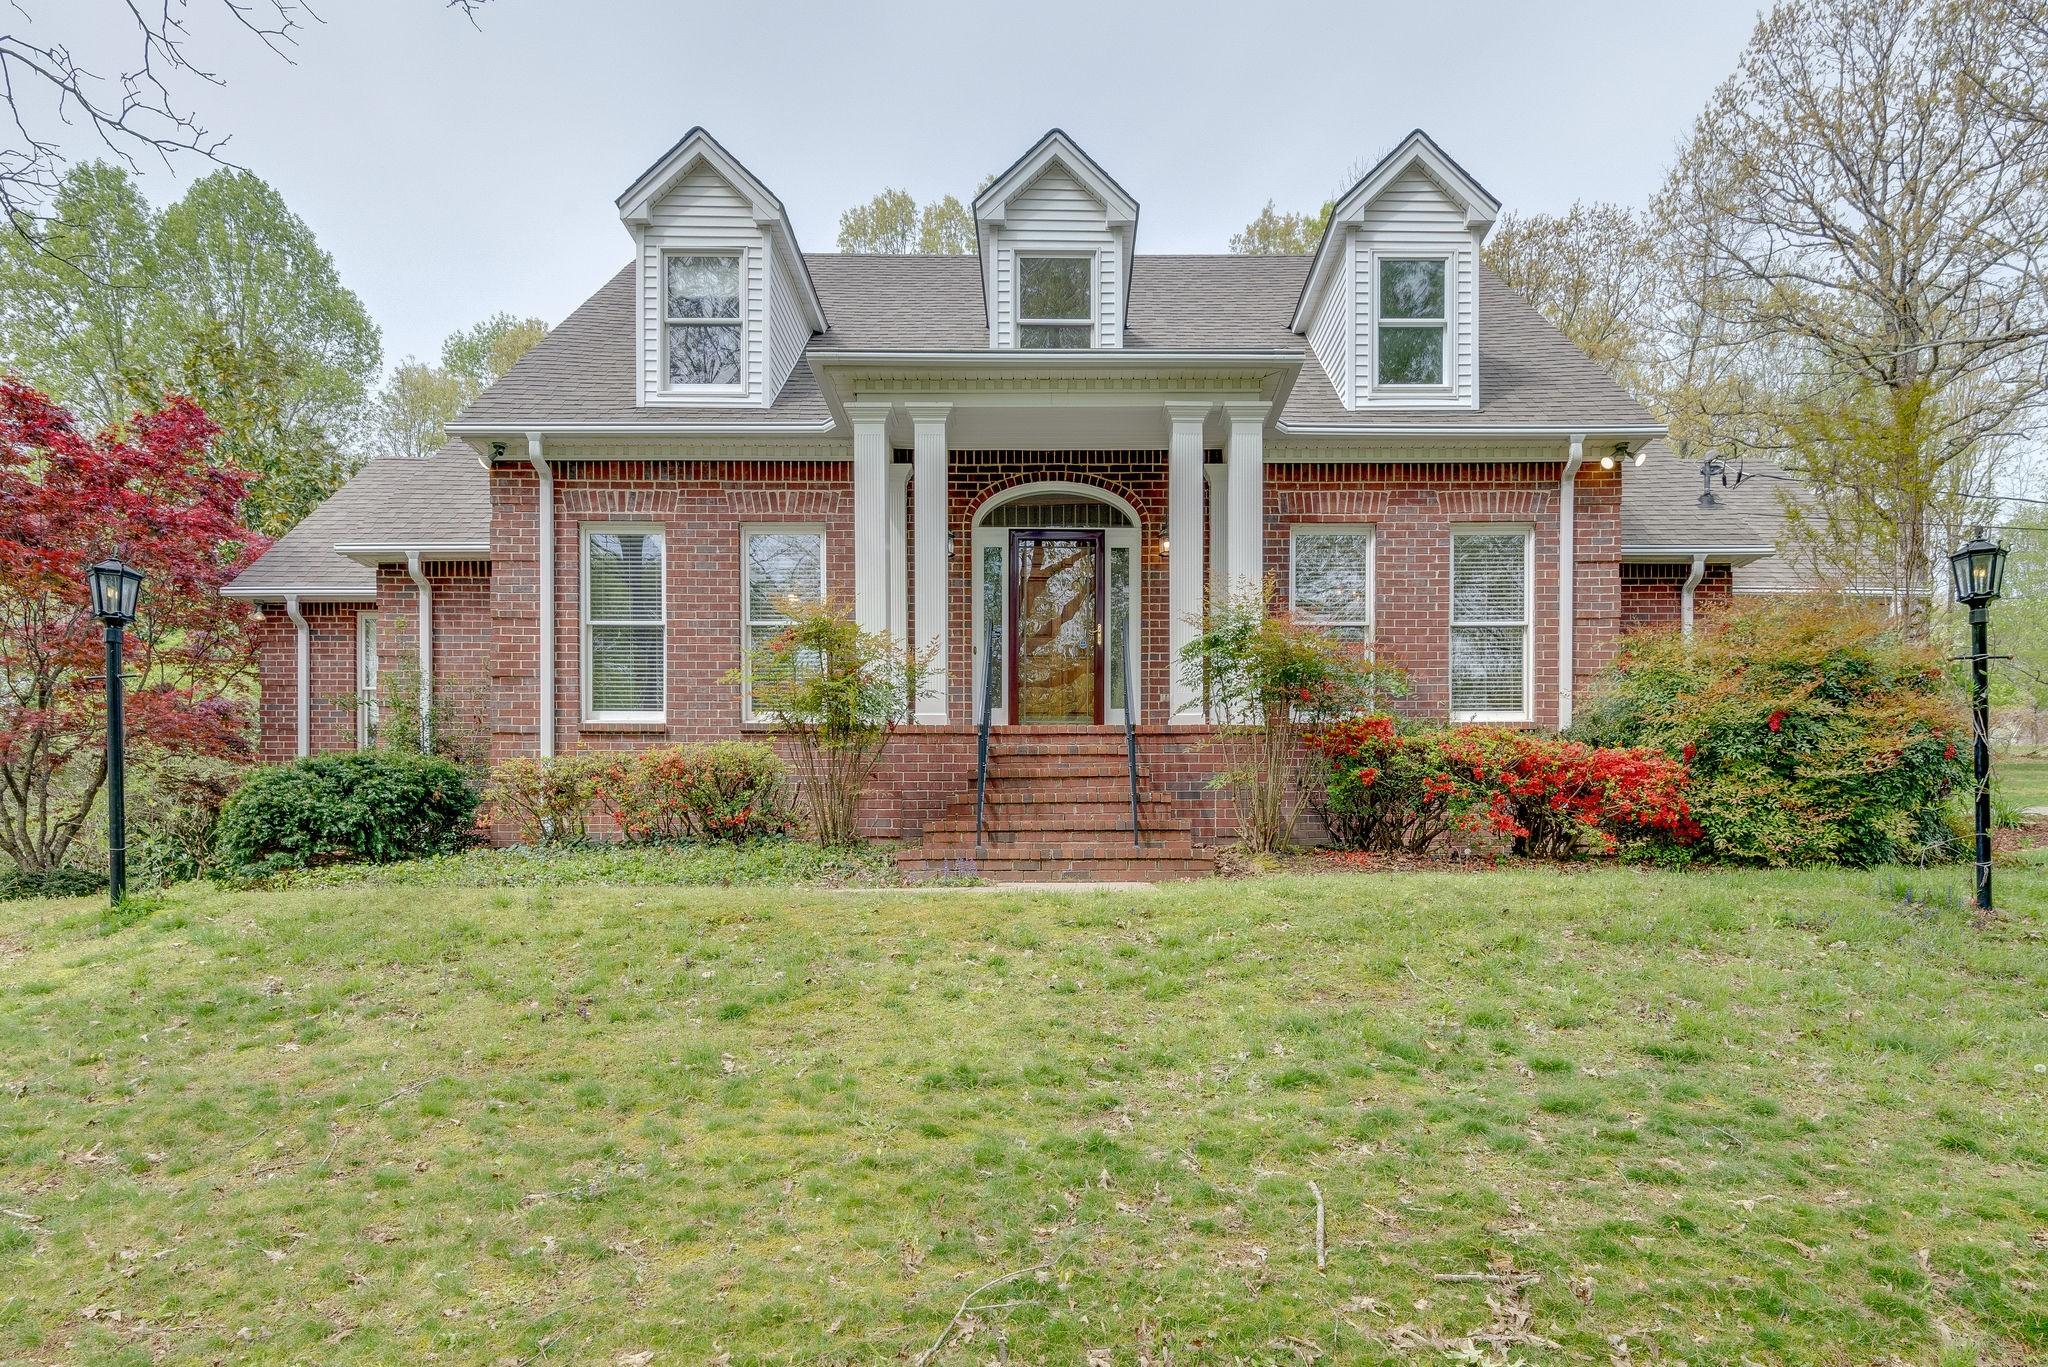 307 Beechwood Dr, NE Property Photo - Burns, TN real estate listing